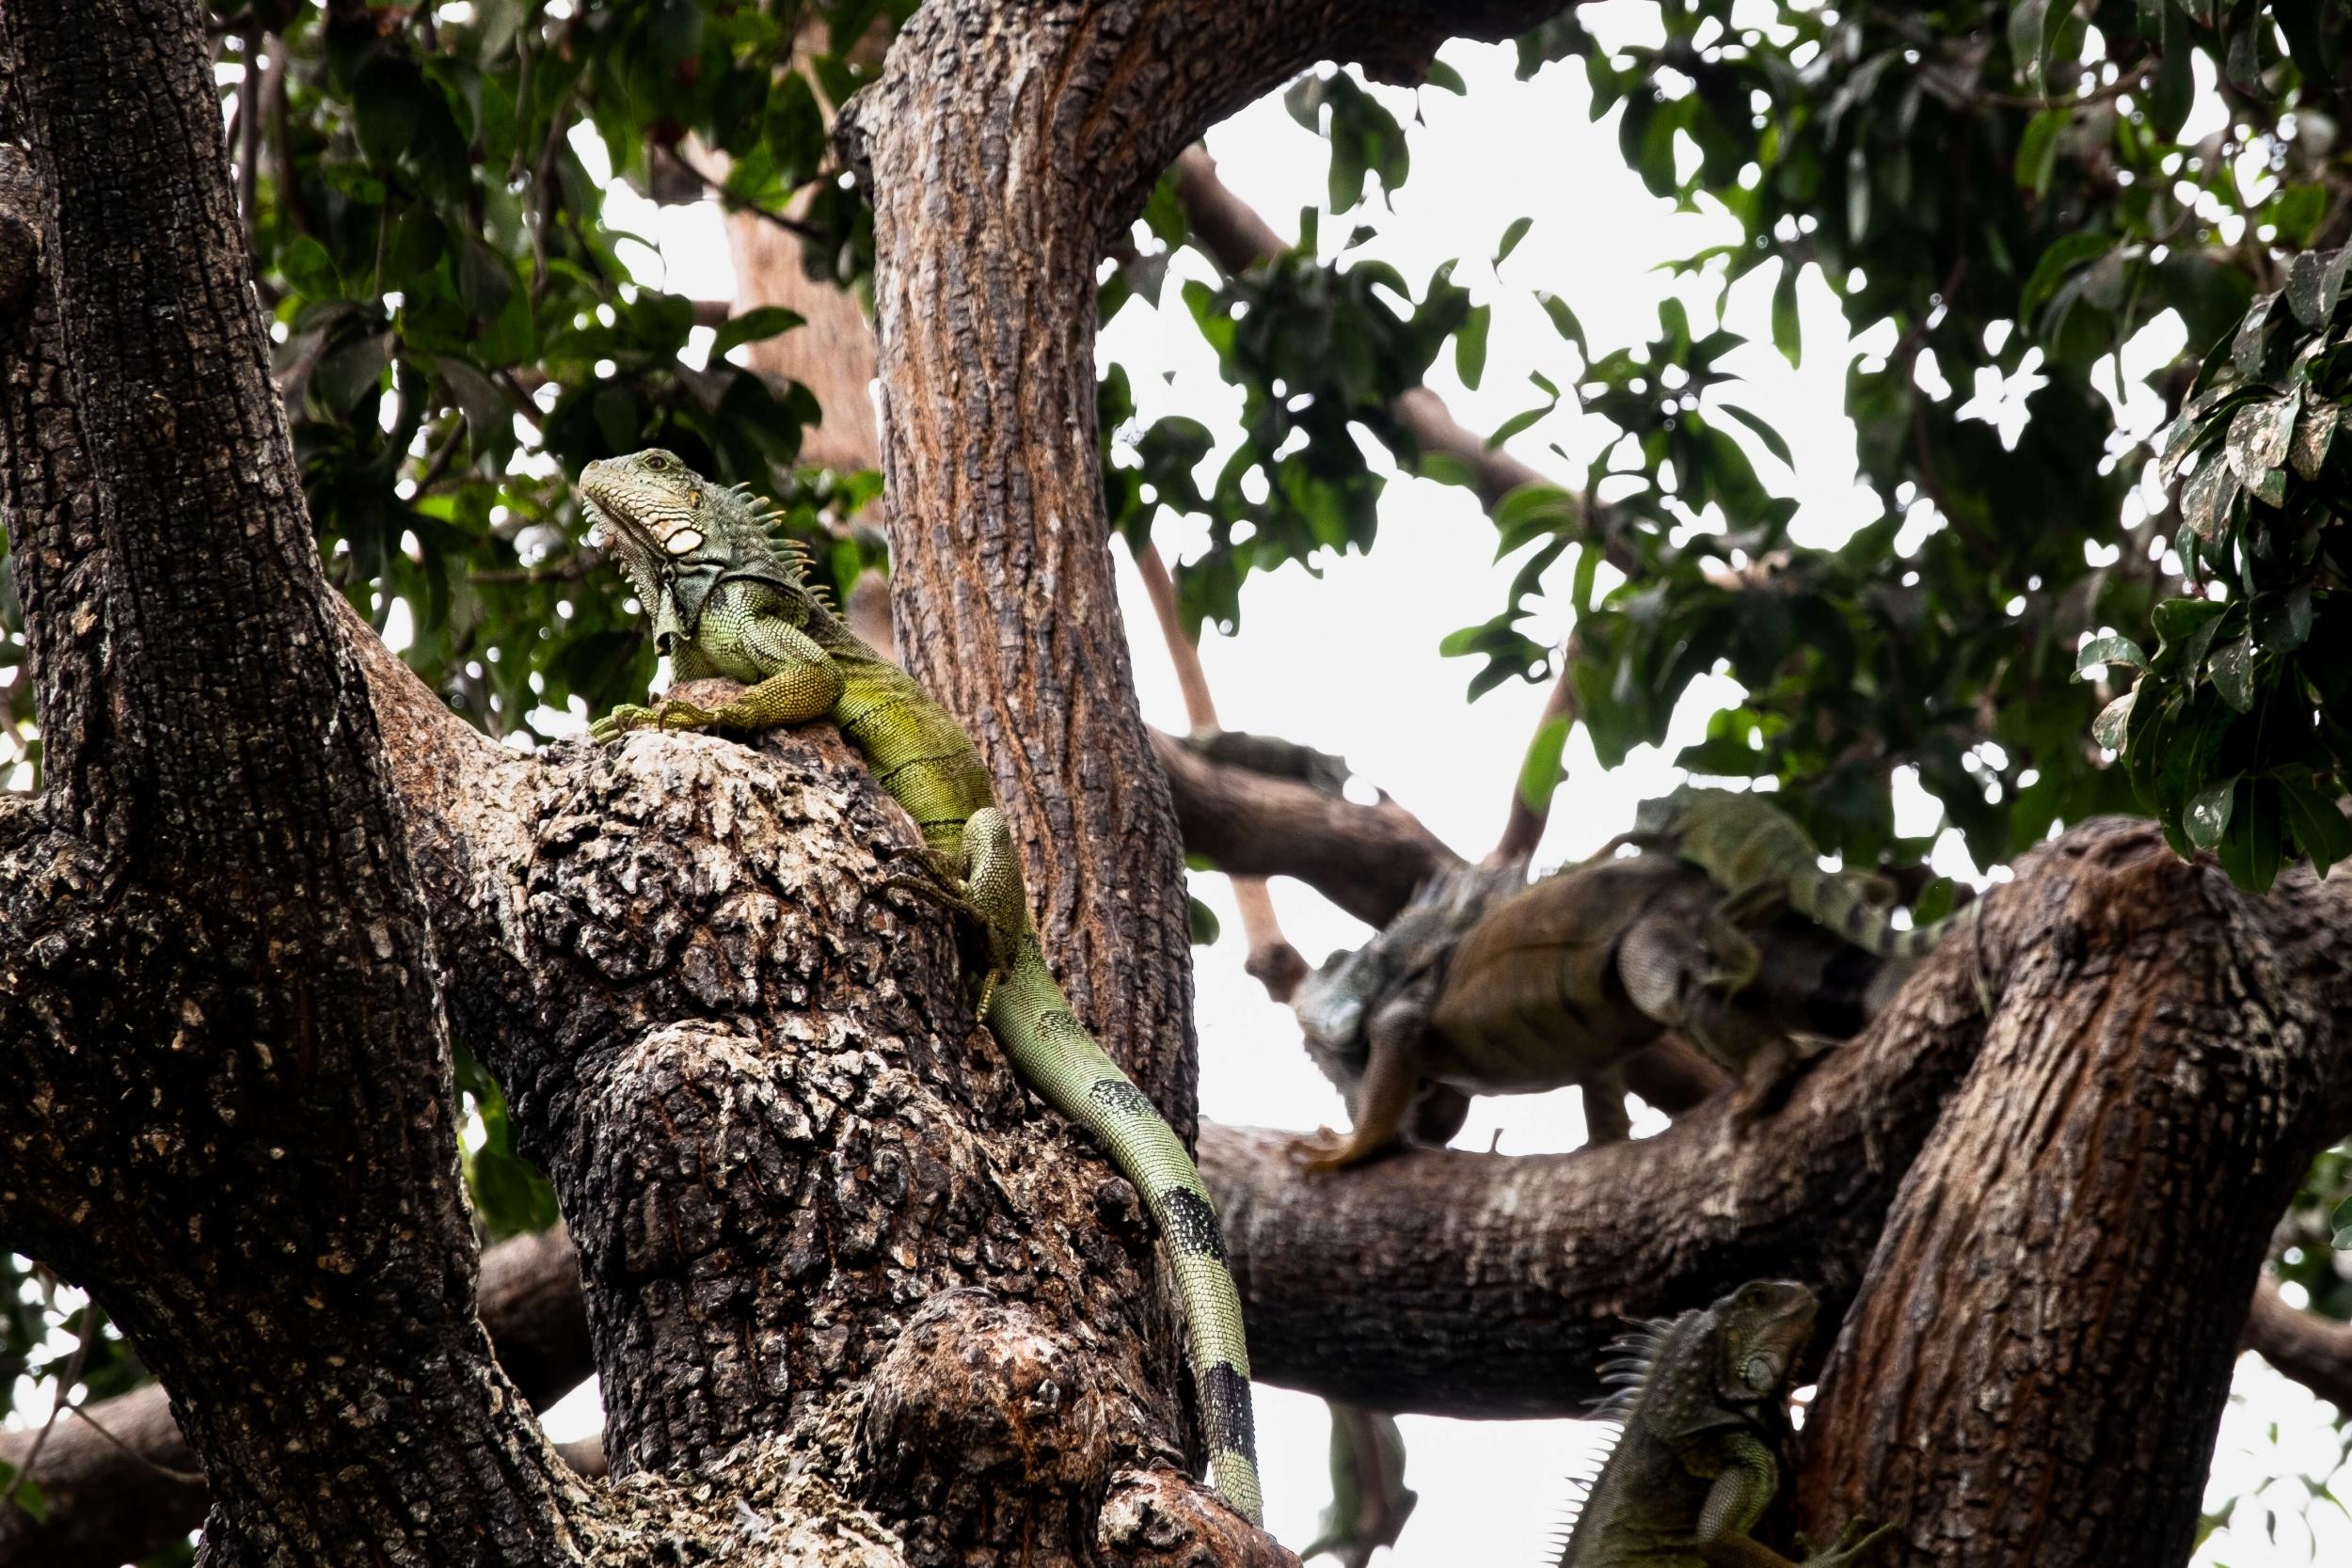 Iguanas, Parque de las iguanas, Guayaquil